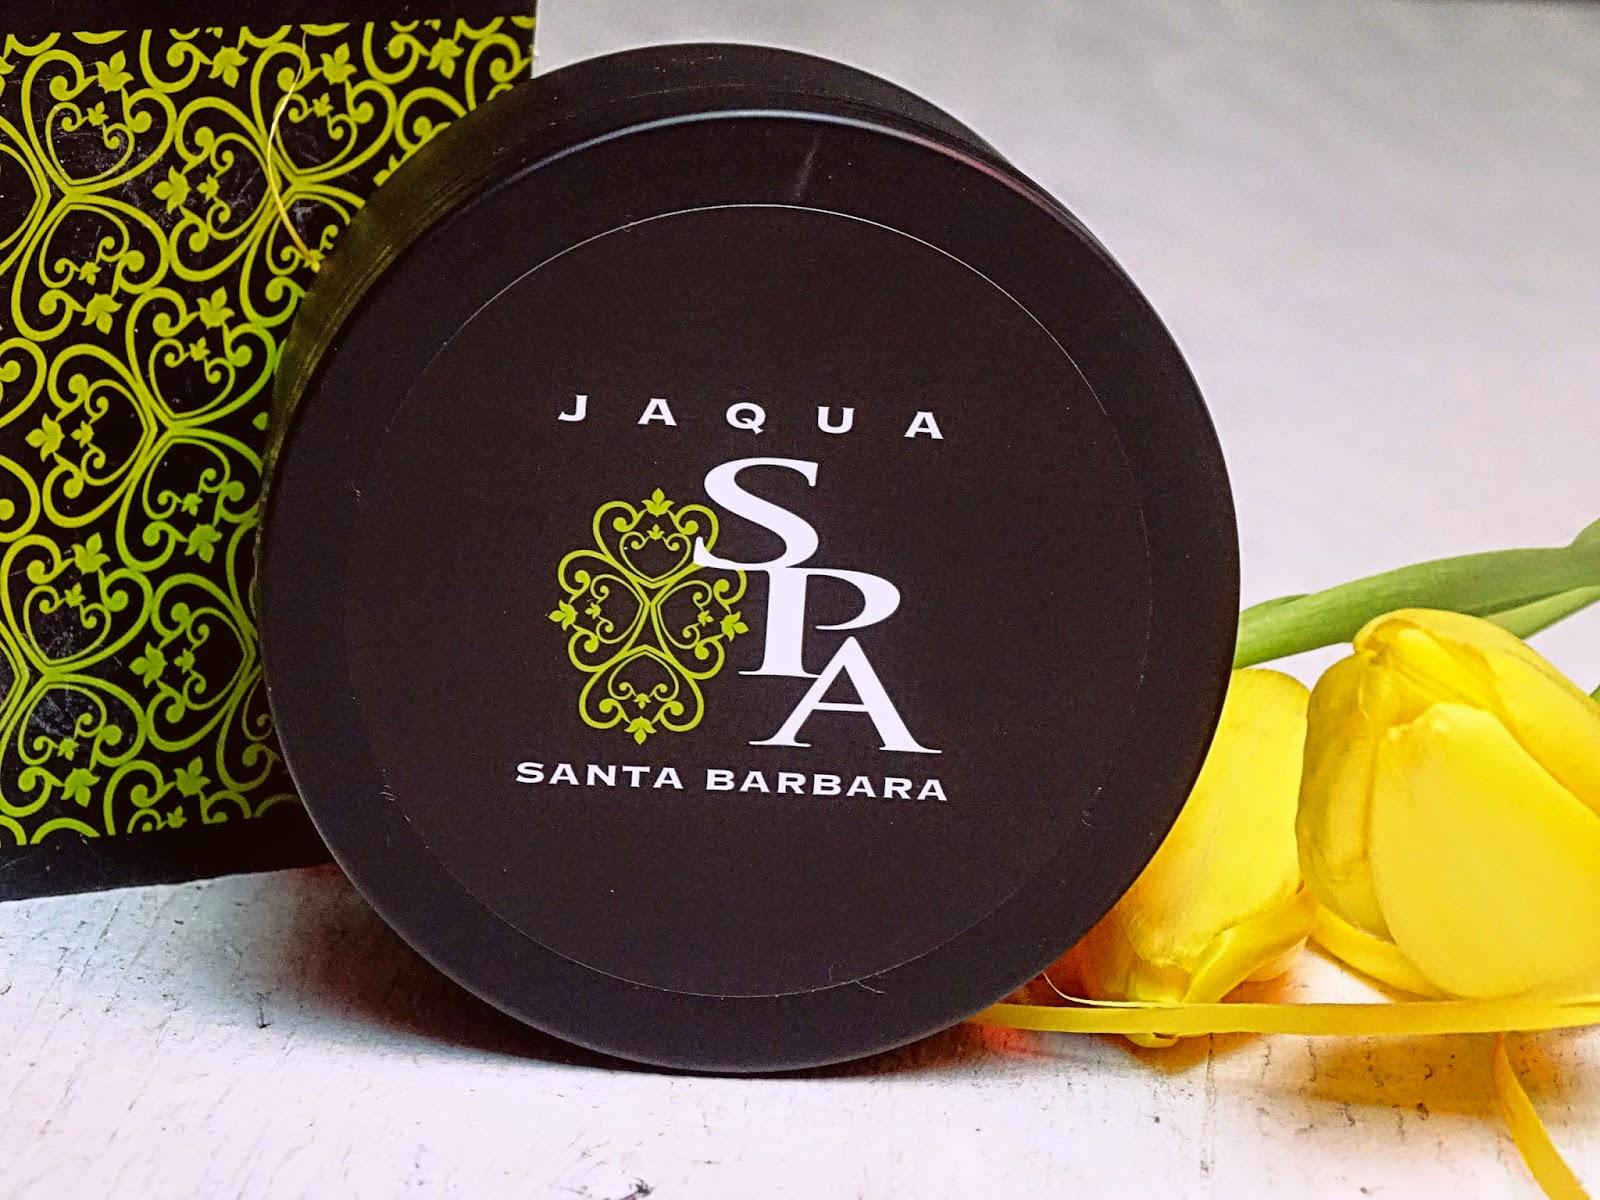 jaqua spa santa barbara